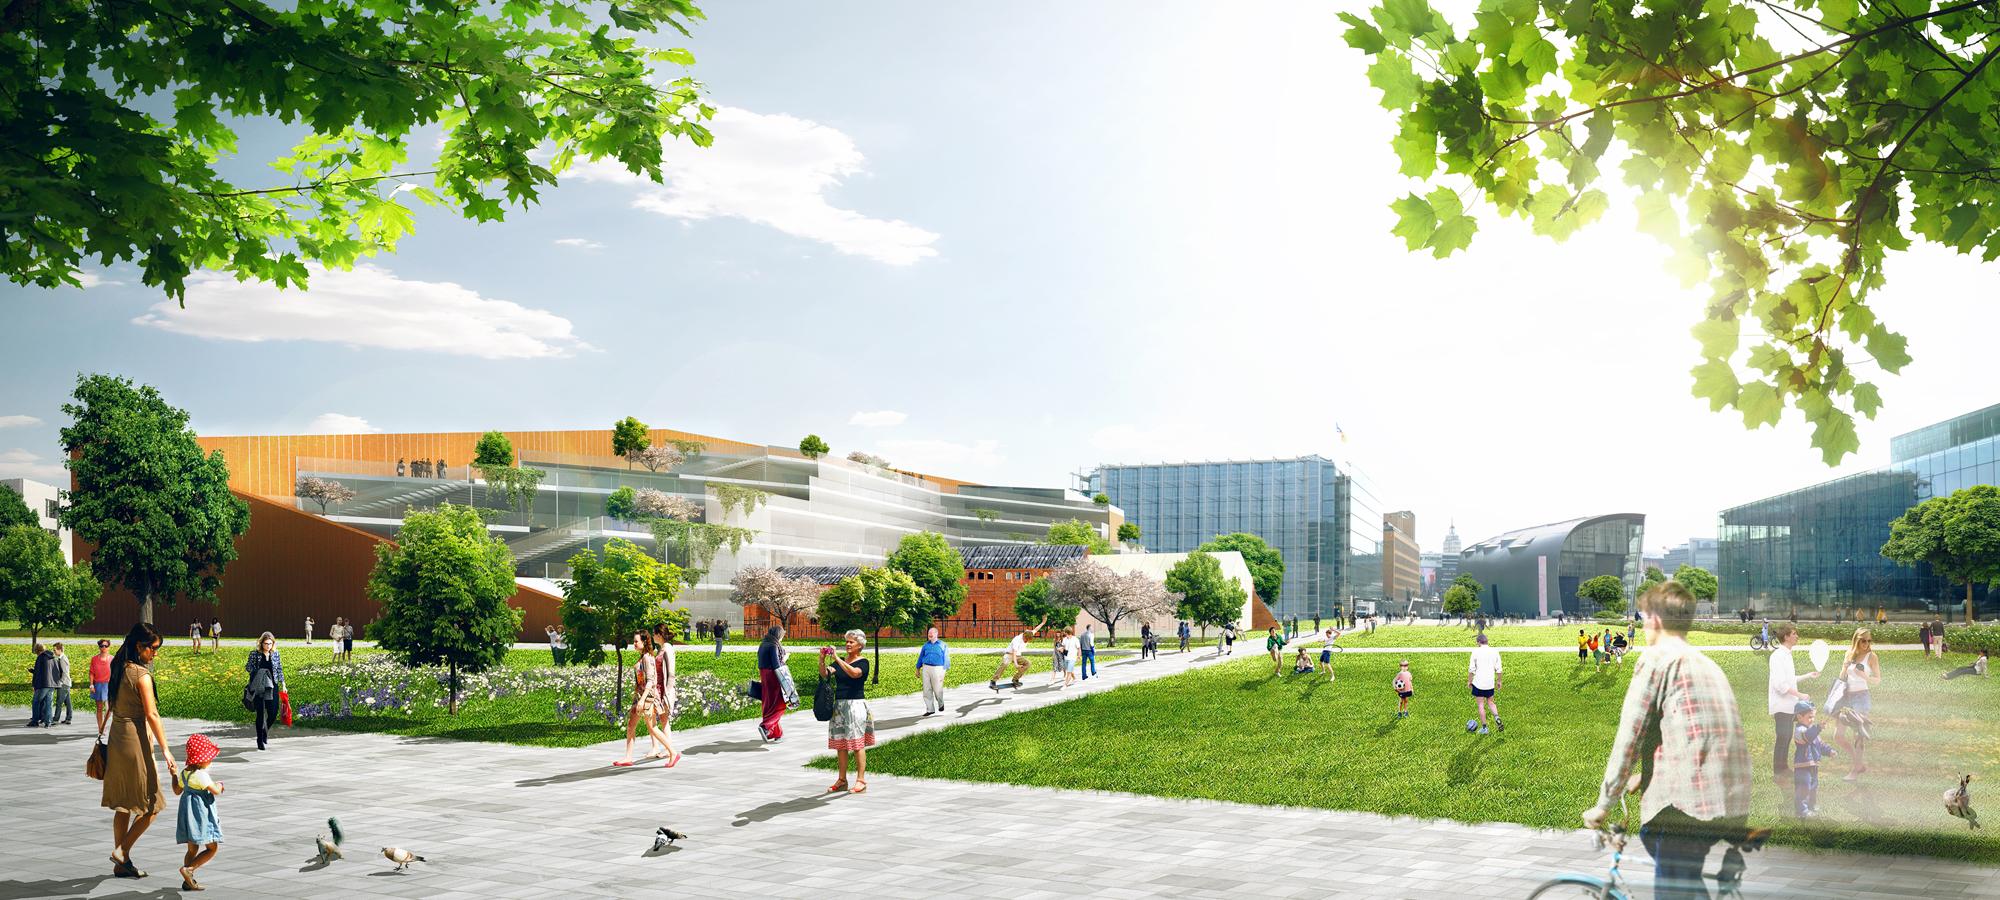 Katariina Sewón and Salla Hoppu: proposal for Helsinki Central Library, 2012